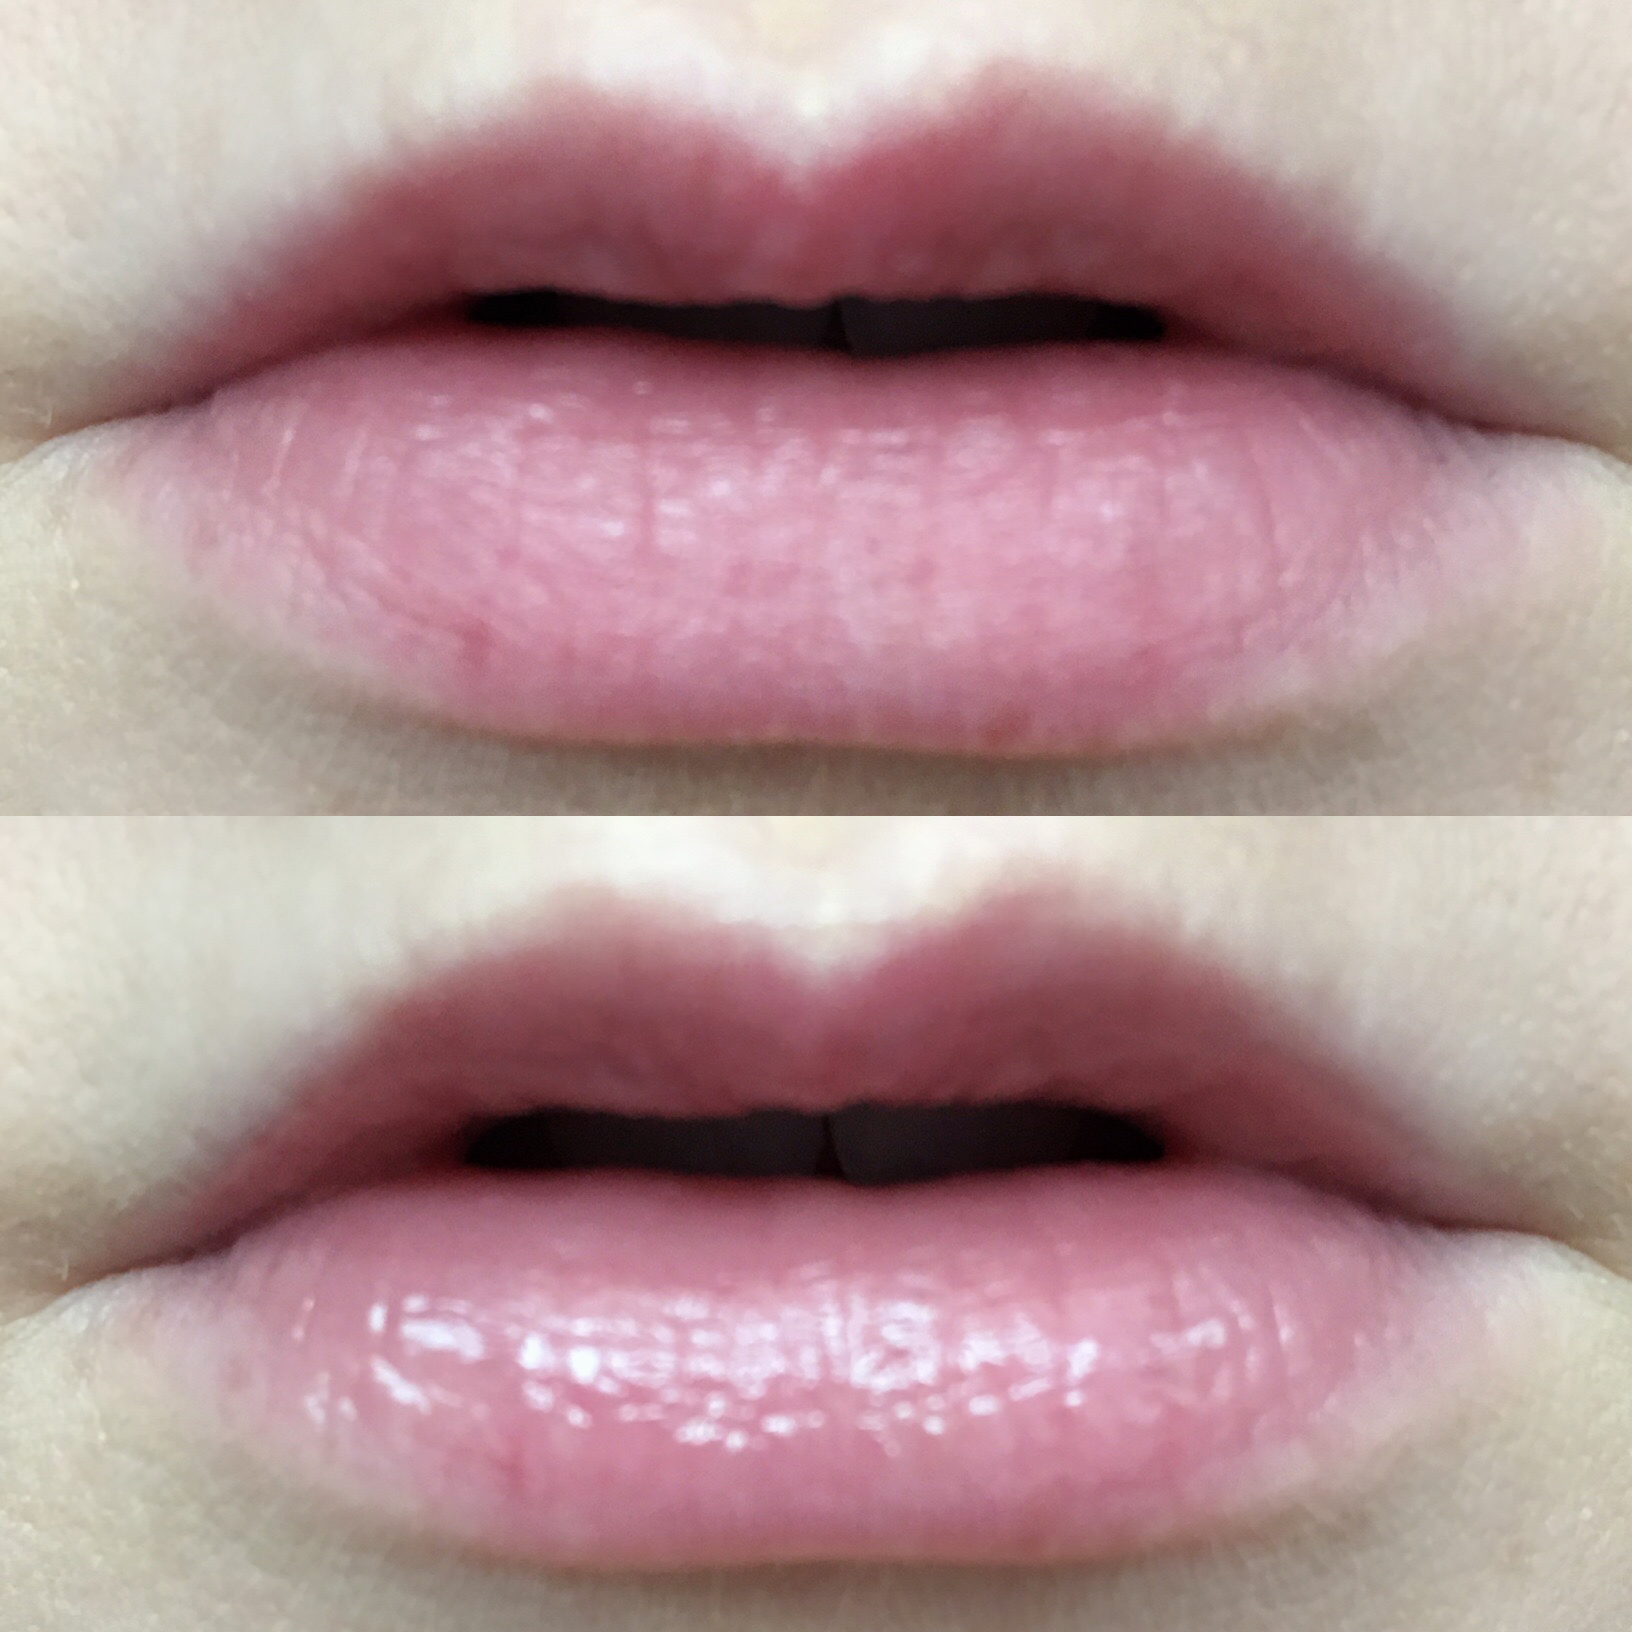 Lip Plumper by Urban Decay #4